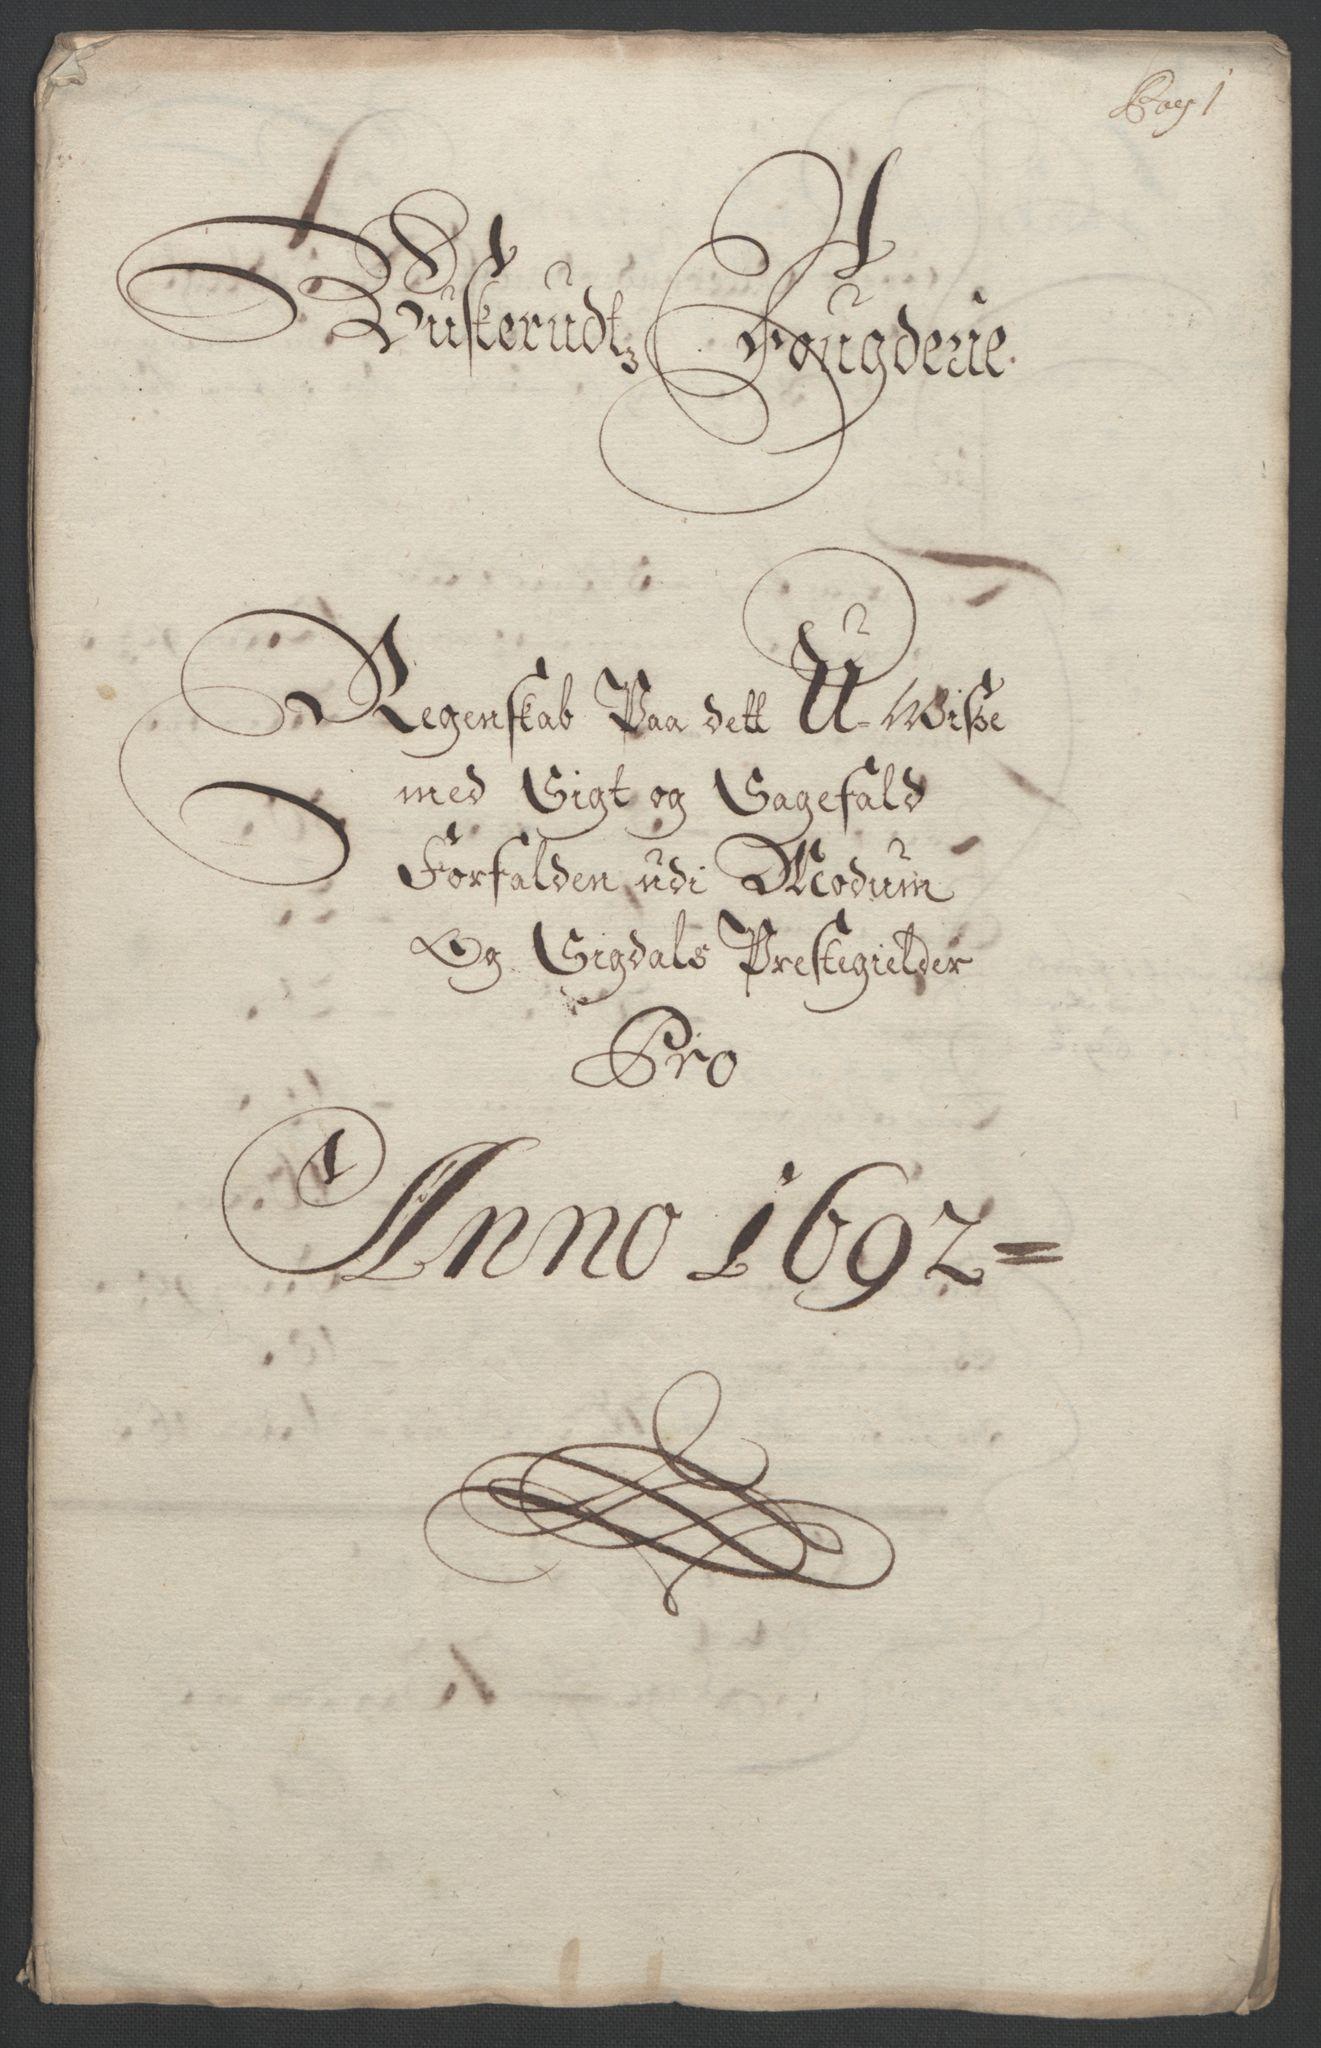 RA, Rentekammeret inntil 1814, Reviderte regnskaper, Fogderegnskap, R25/L1681: Fogderegnskap Buskerud, 1691-1692, s. 338